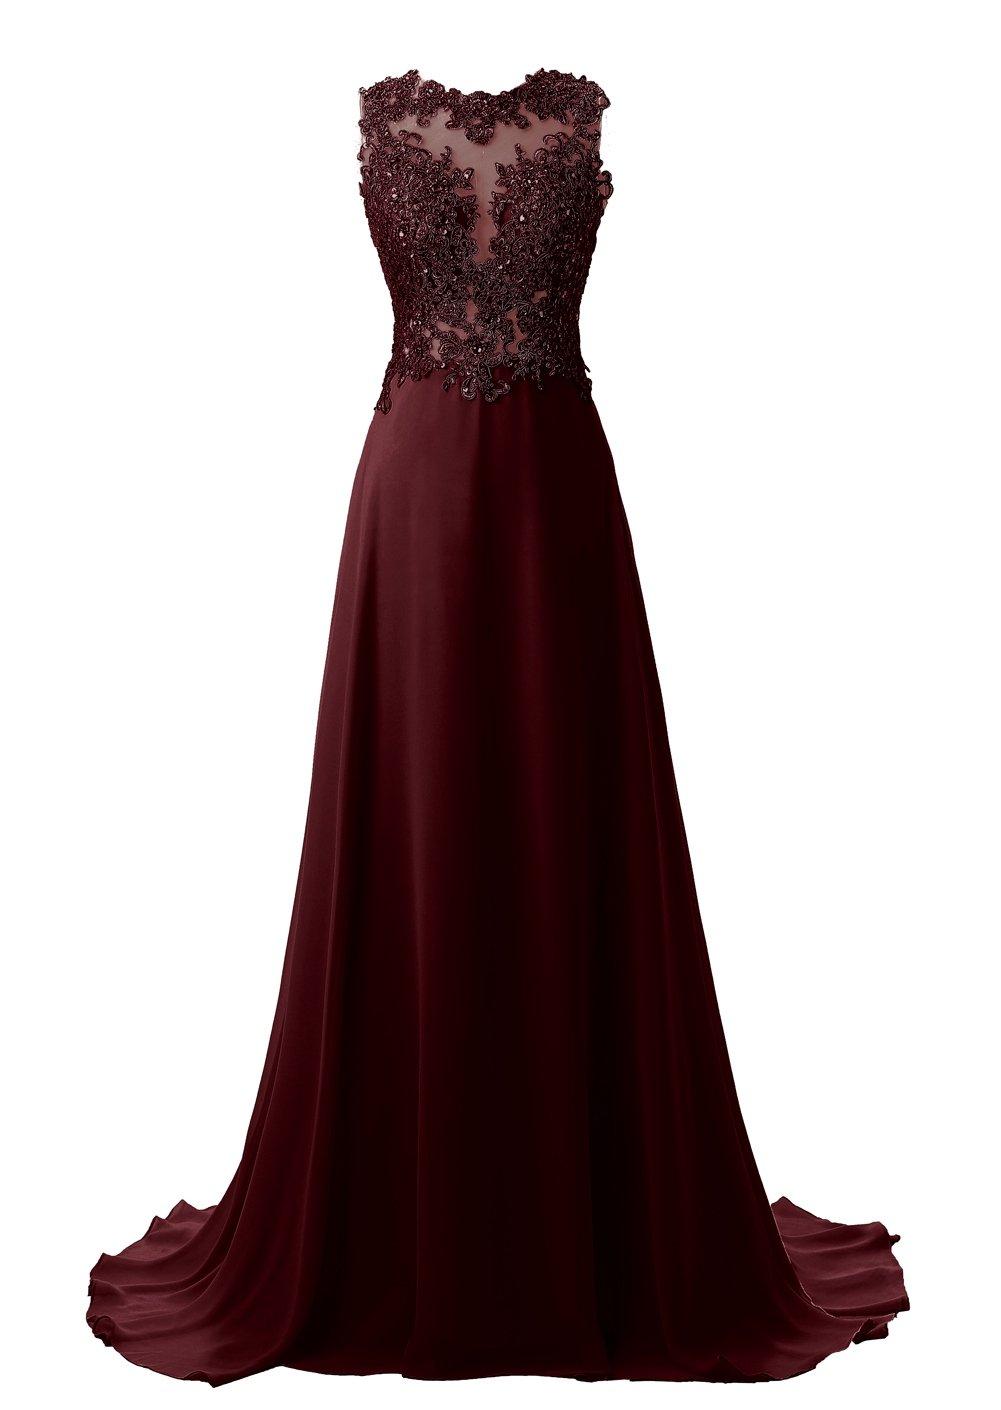 Burgundy Prom Dresses 2017 Long: Amazon.com